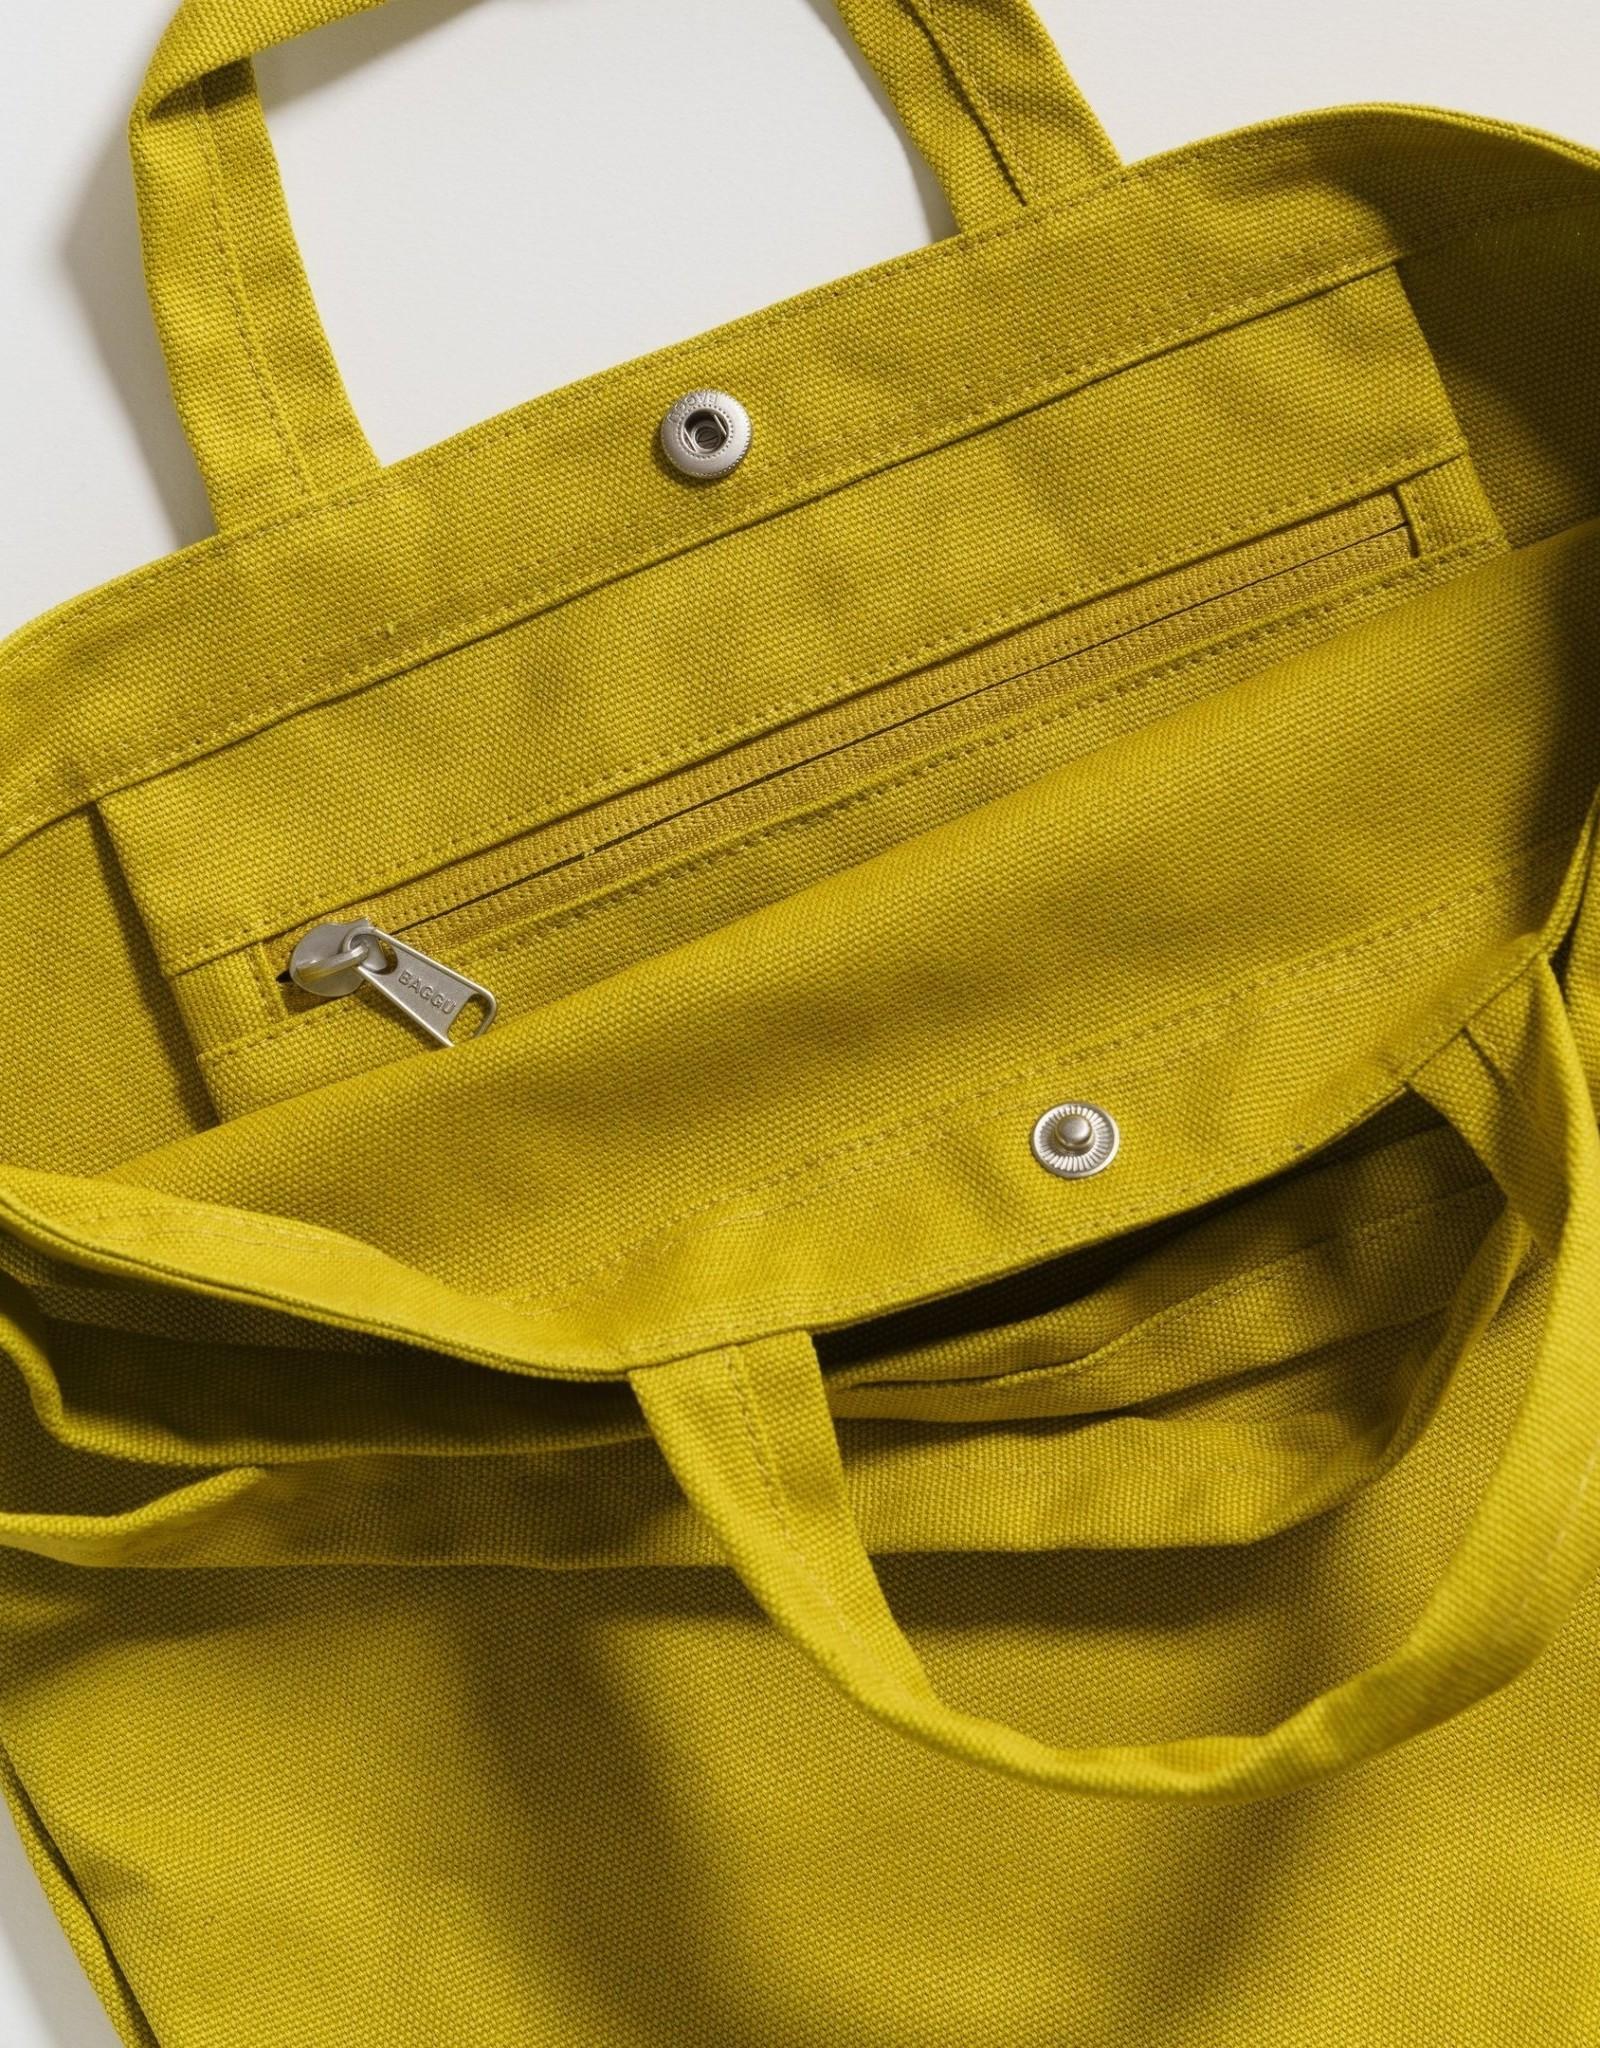 Baggu Prepared Baggu Bag by Franklin Habit